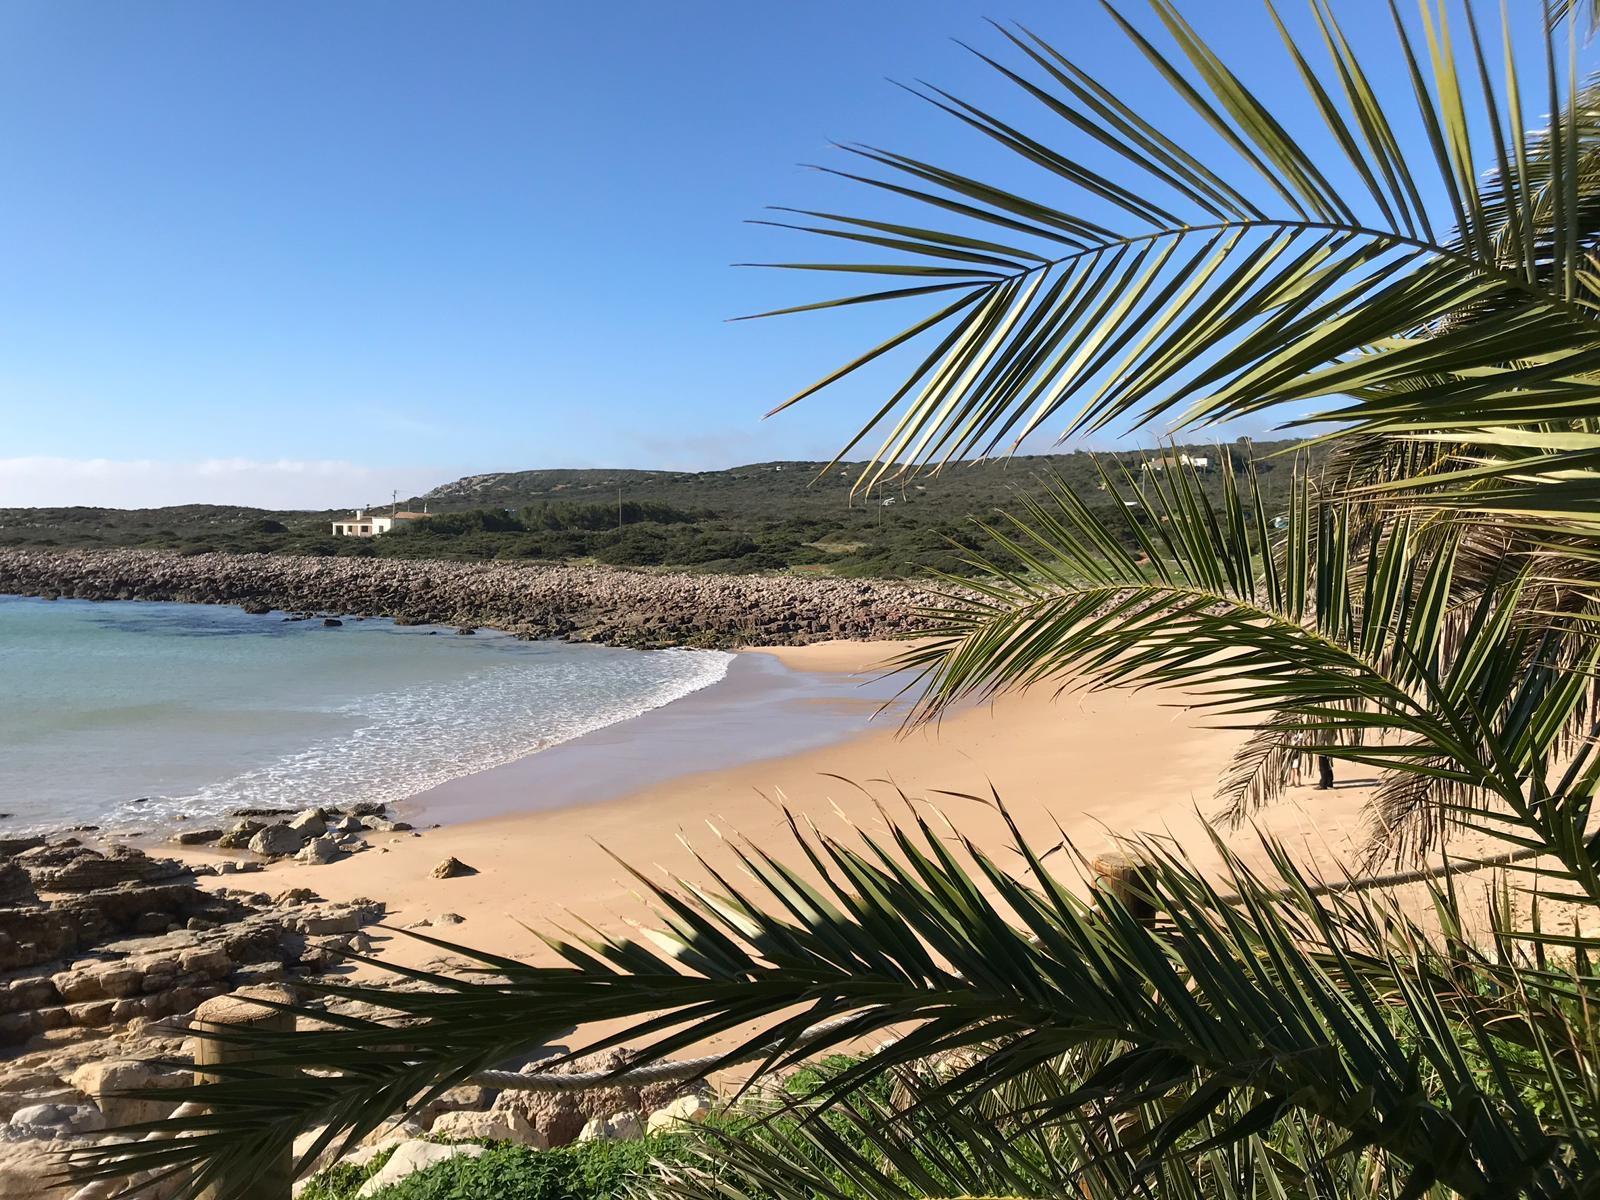 Praia da Ingrina bei Vila do Bispo